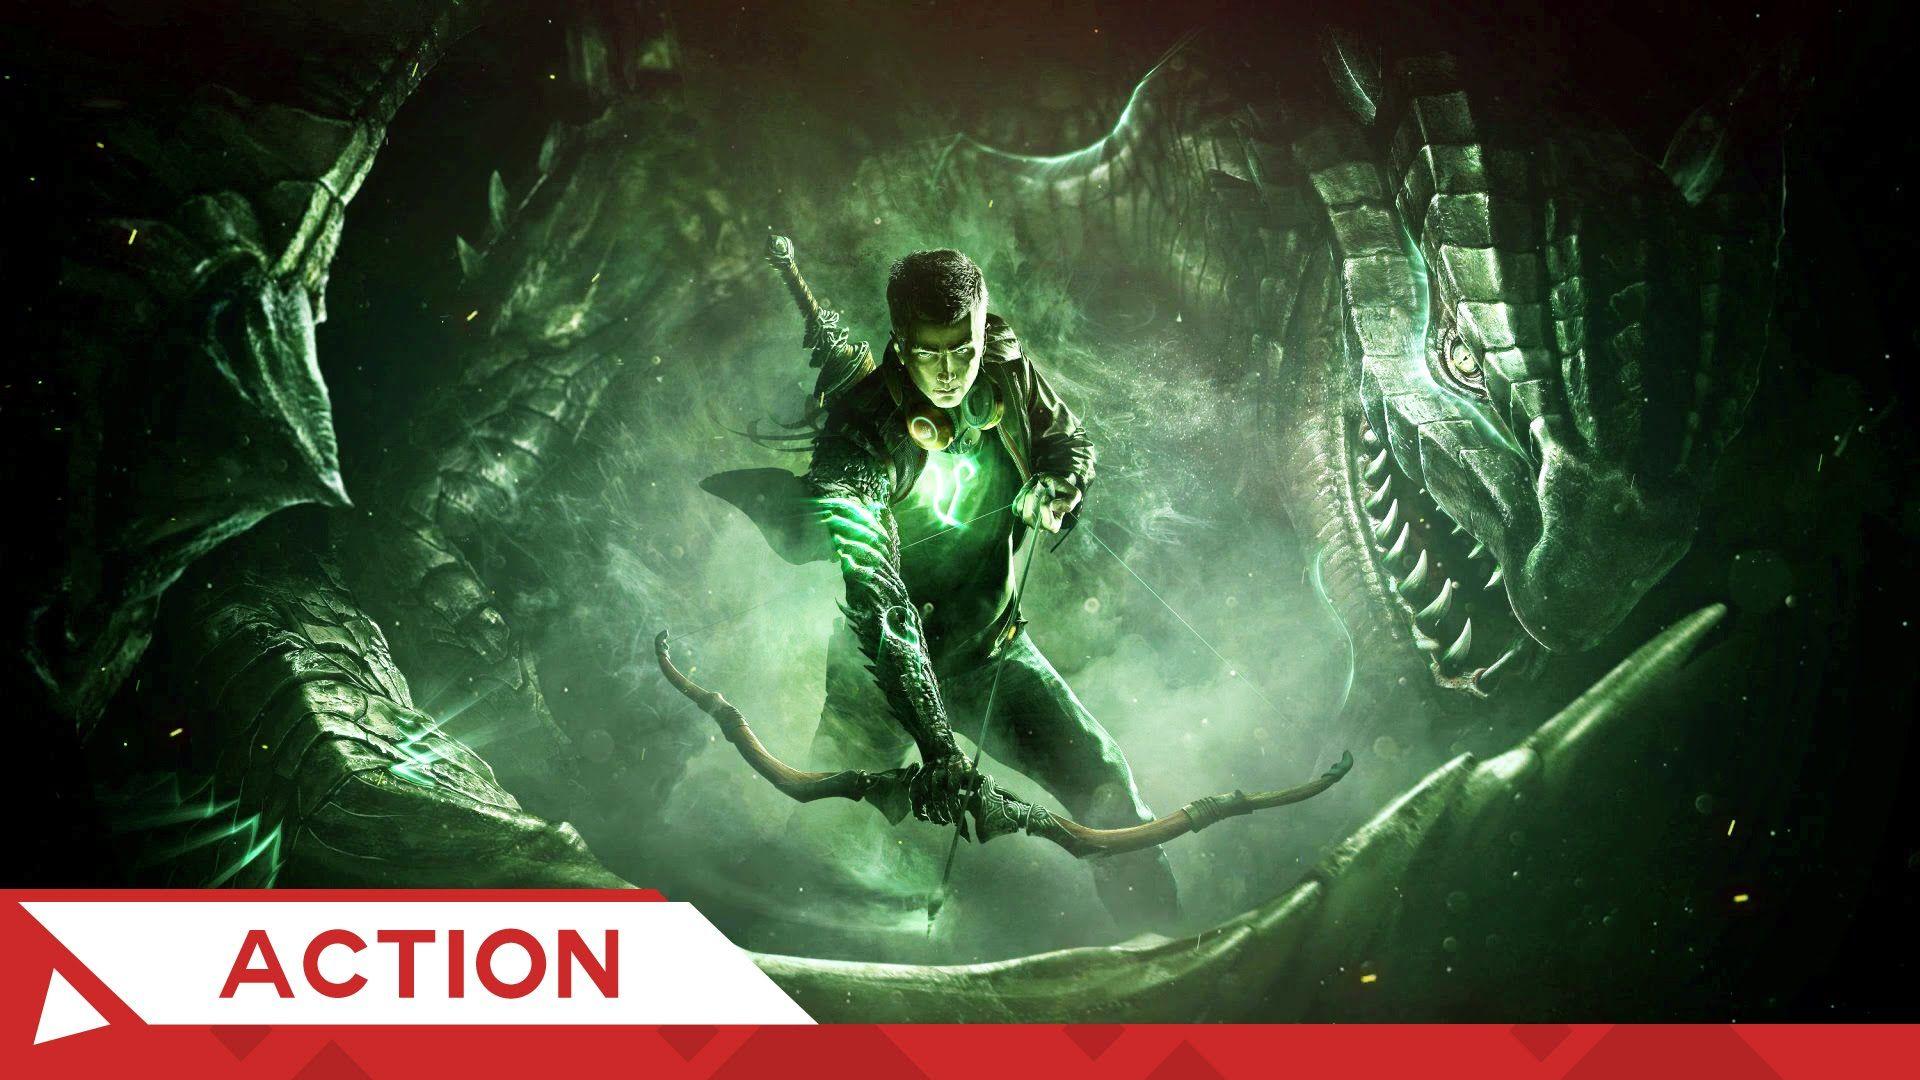 Amadeus Indetzki - To Infinity | Massive Intense Battle | Epic Action | ...